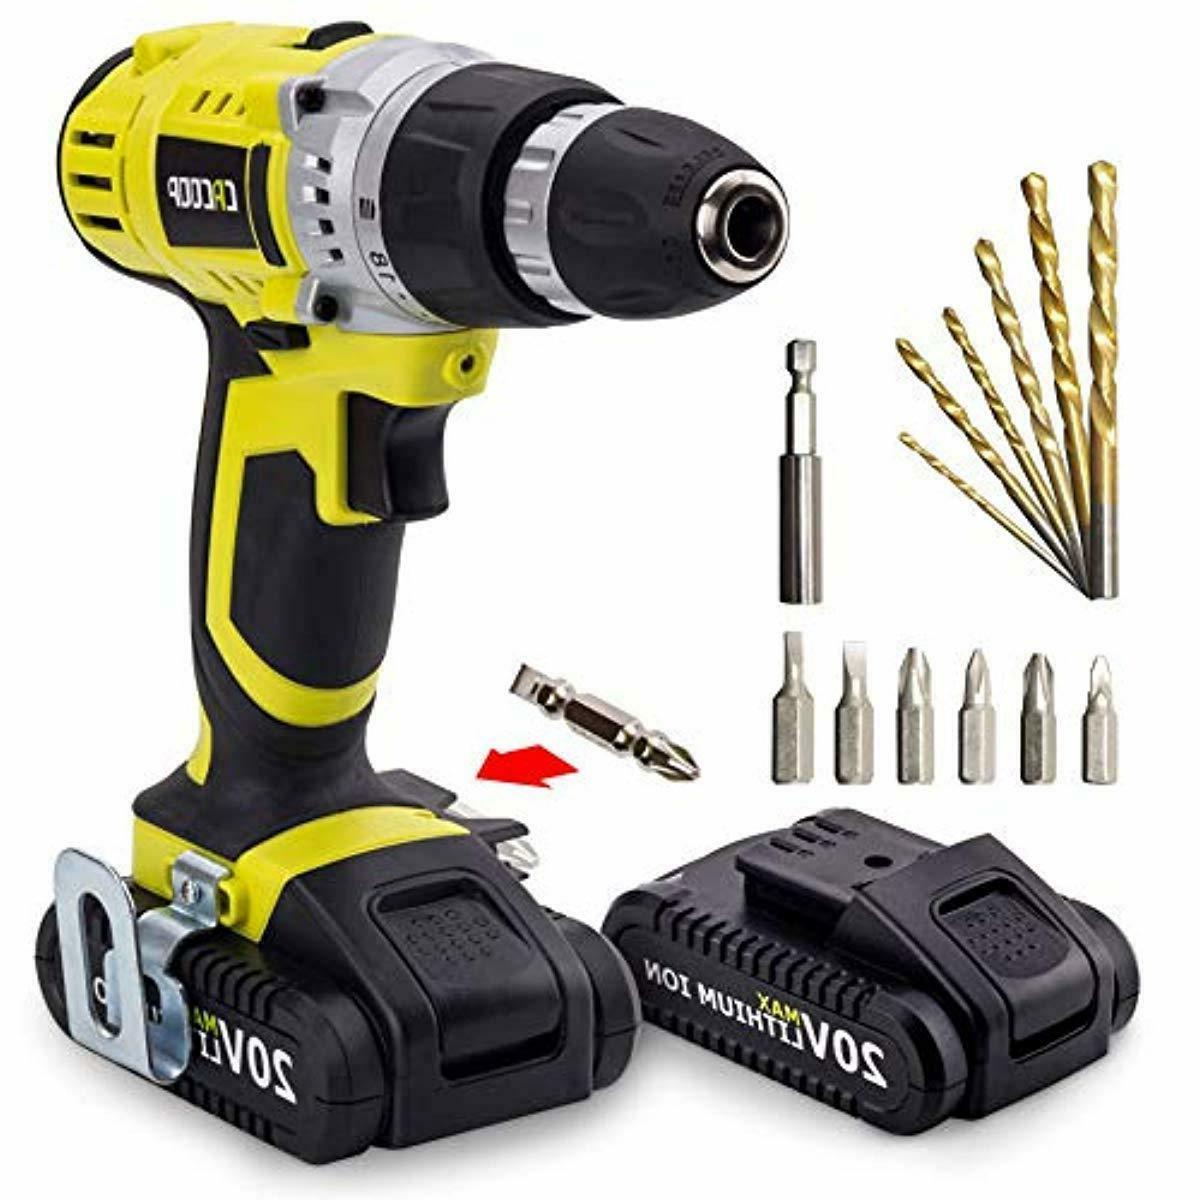 20v max cordless drill driver set